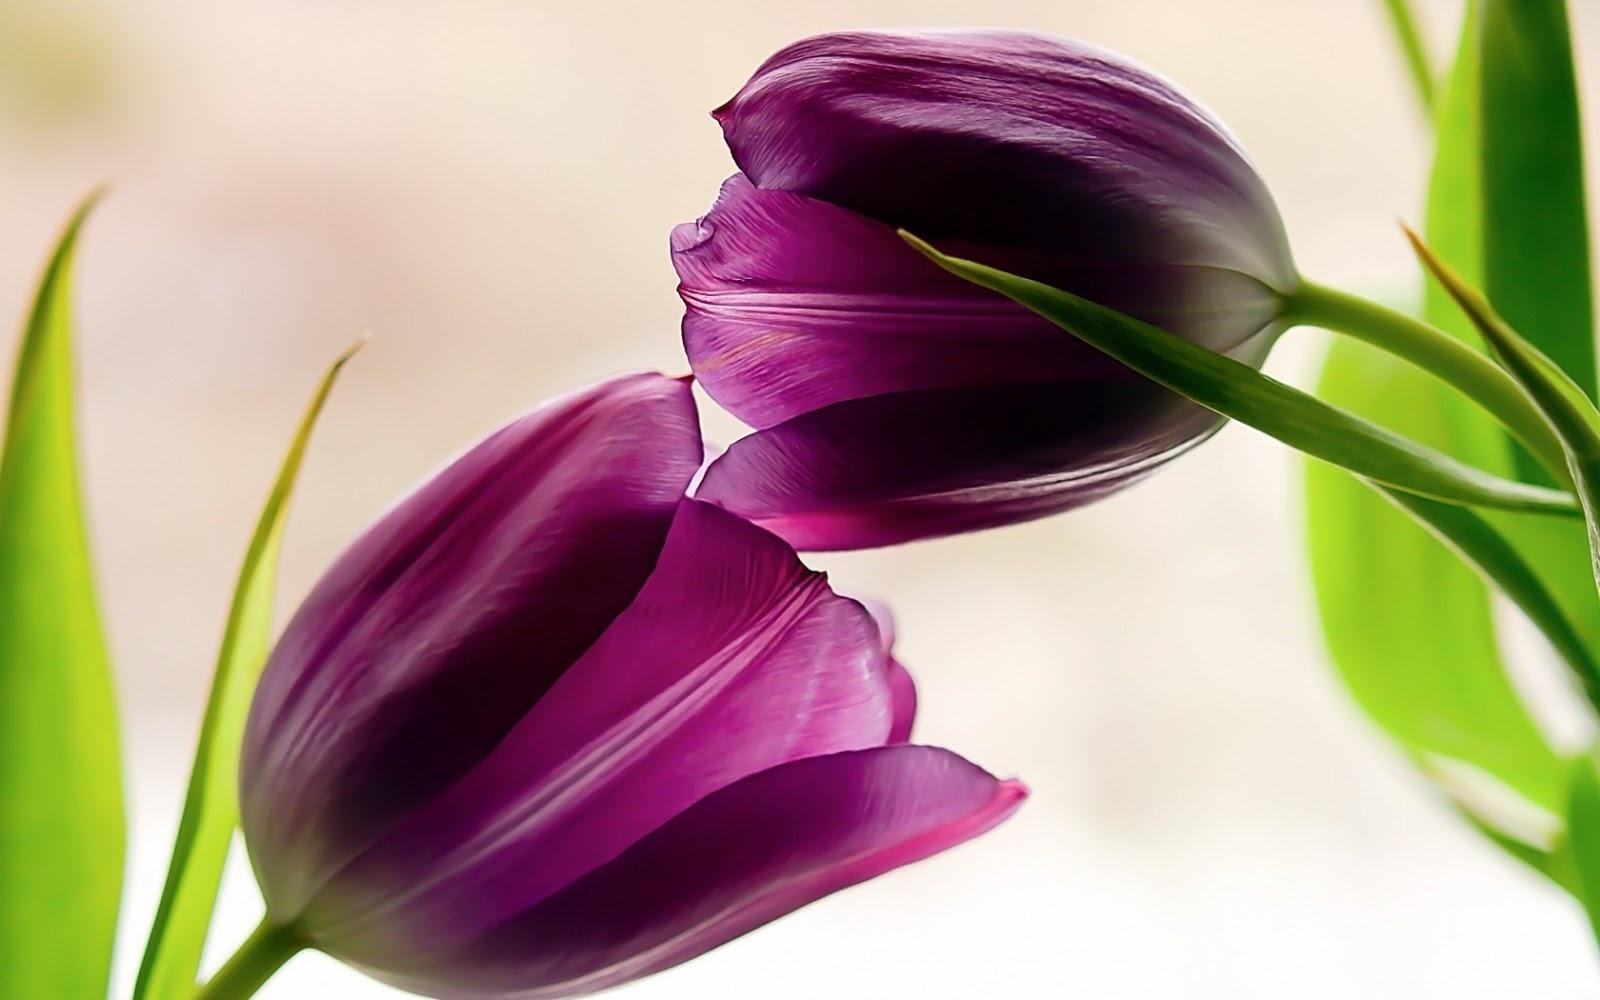 Flowers World Beautiful Tulips Flowers